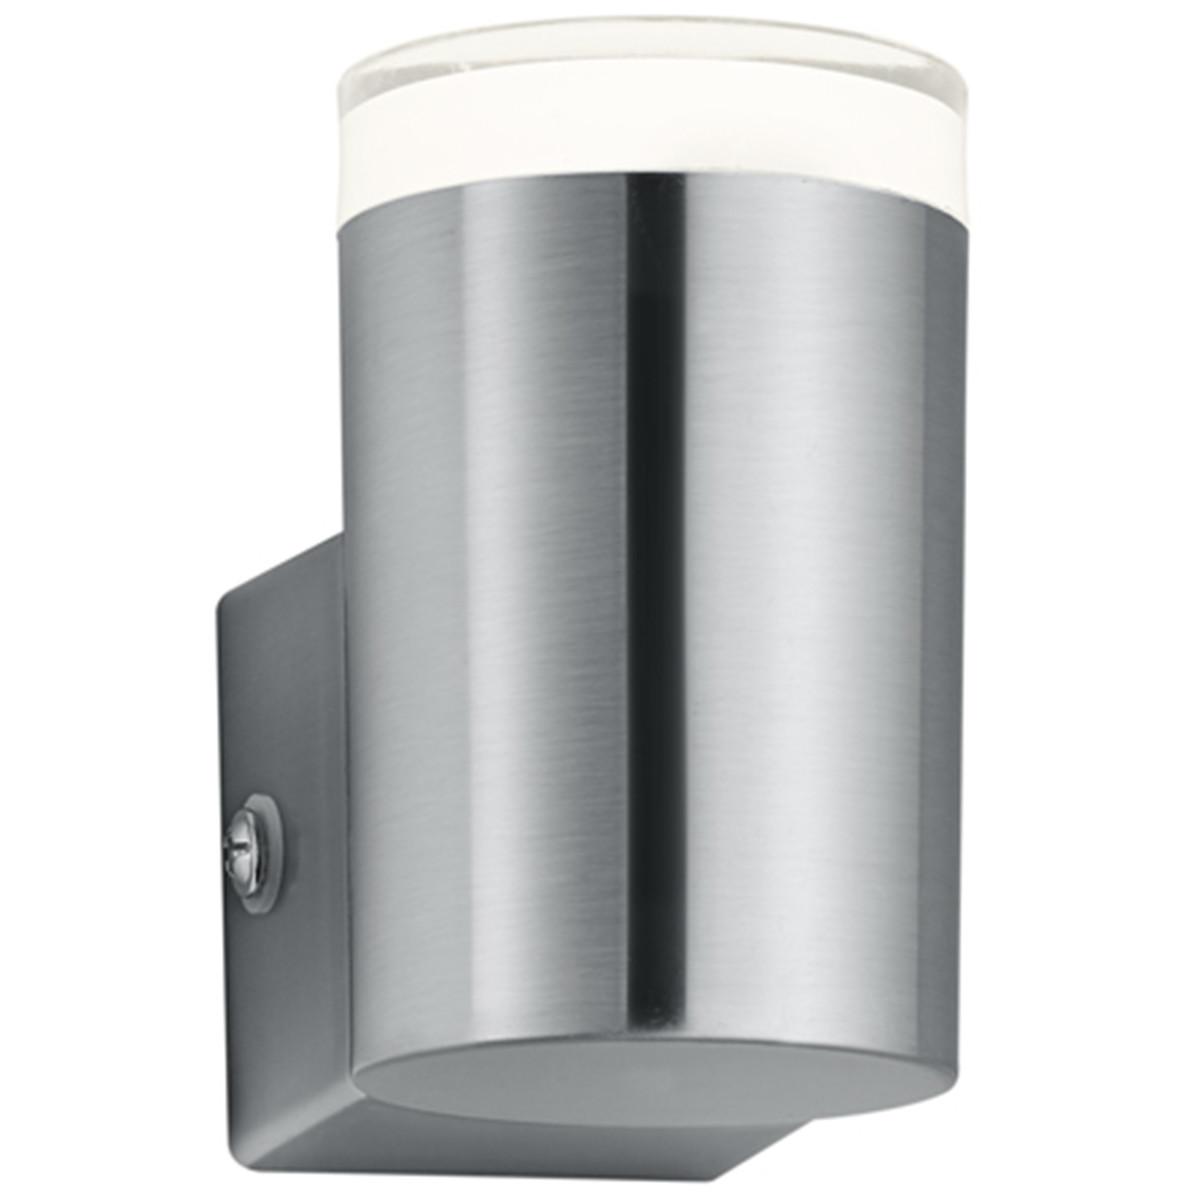 LED Tuinverlichting - Tuinlamp - Trion Arinat - Wand - 4W - Warm Wit 3000K - Rond - Mat Nikkel - Alu